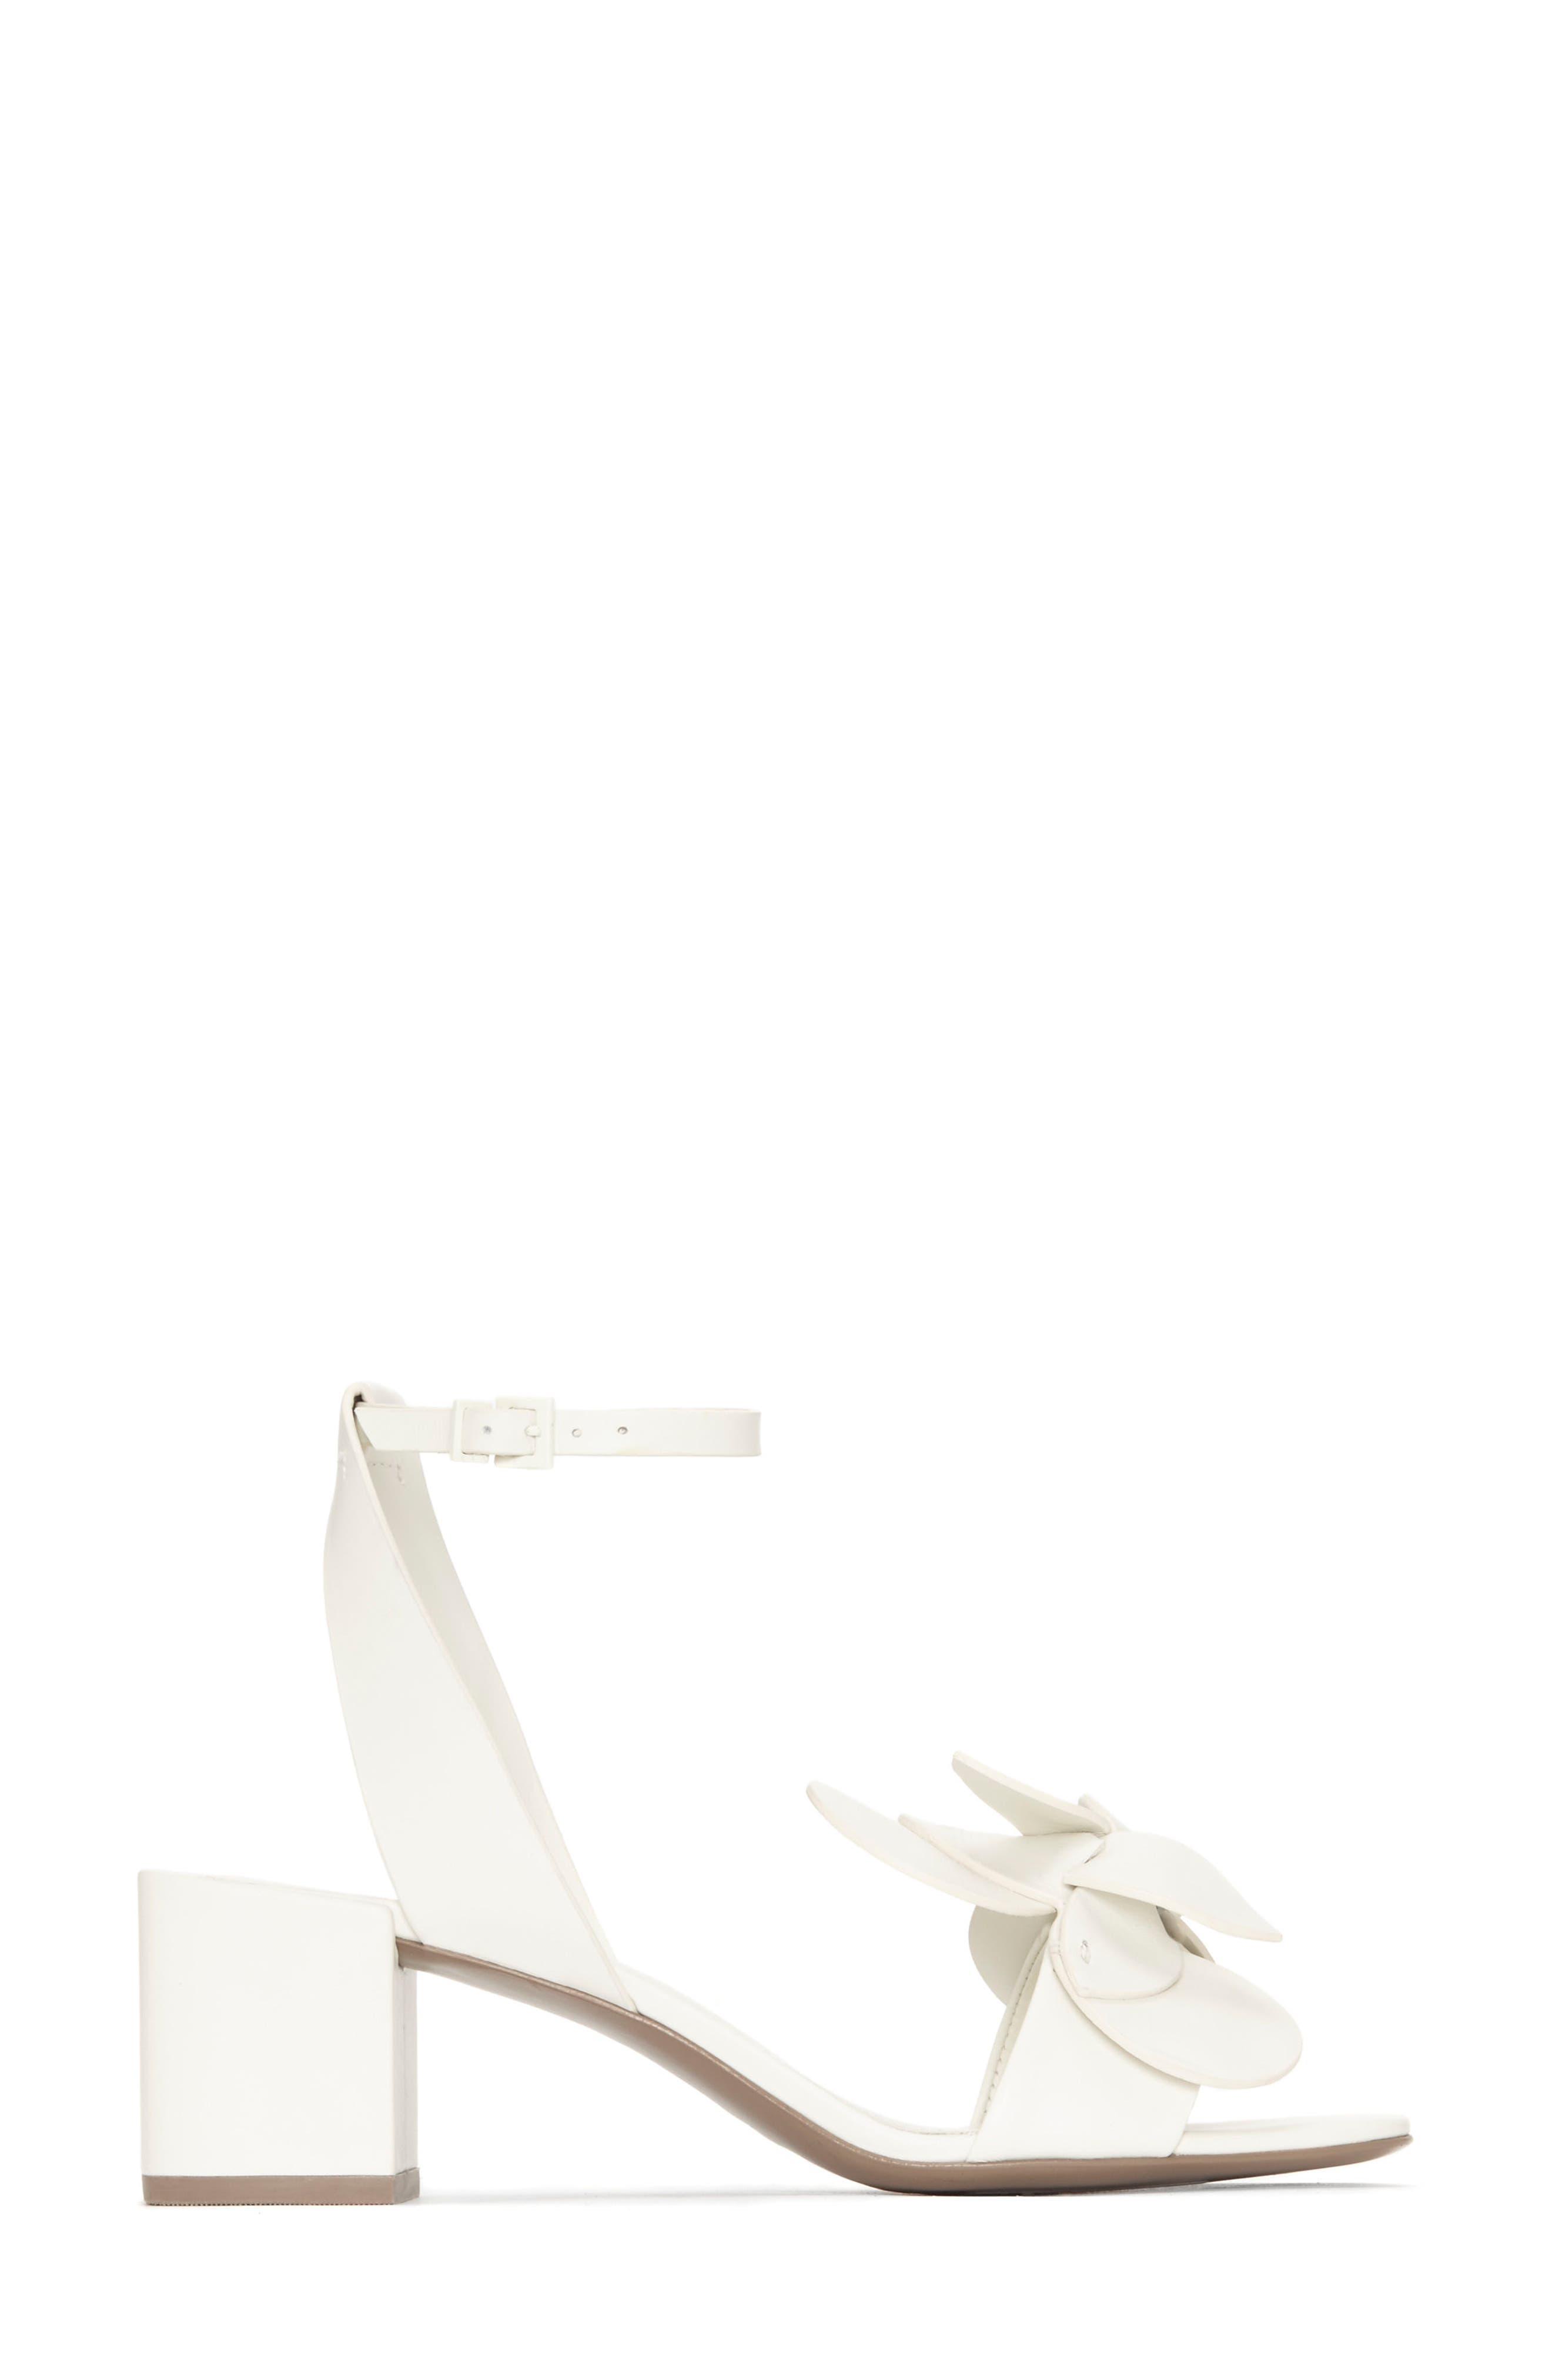 Tealia Sculpted Floral Sandal,                             Alternate thumbnail 3, color,